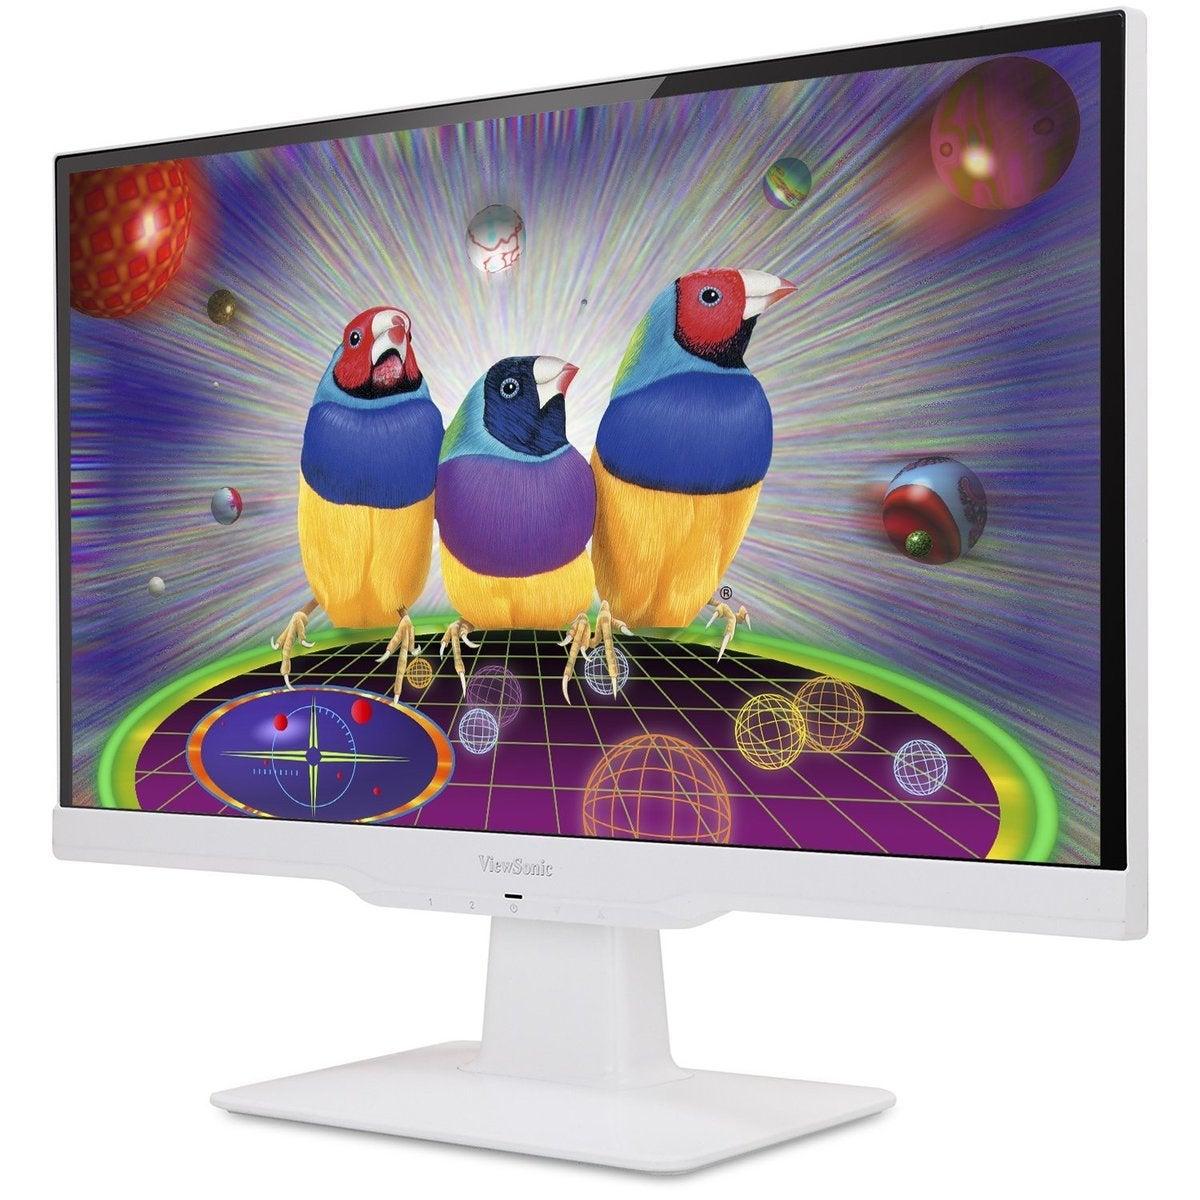 ViewSonic VX2263Smhl 22inch FHD Monitor